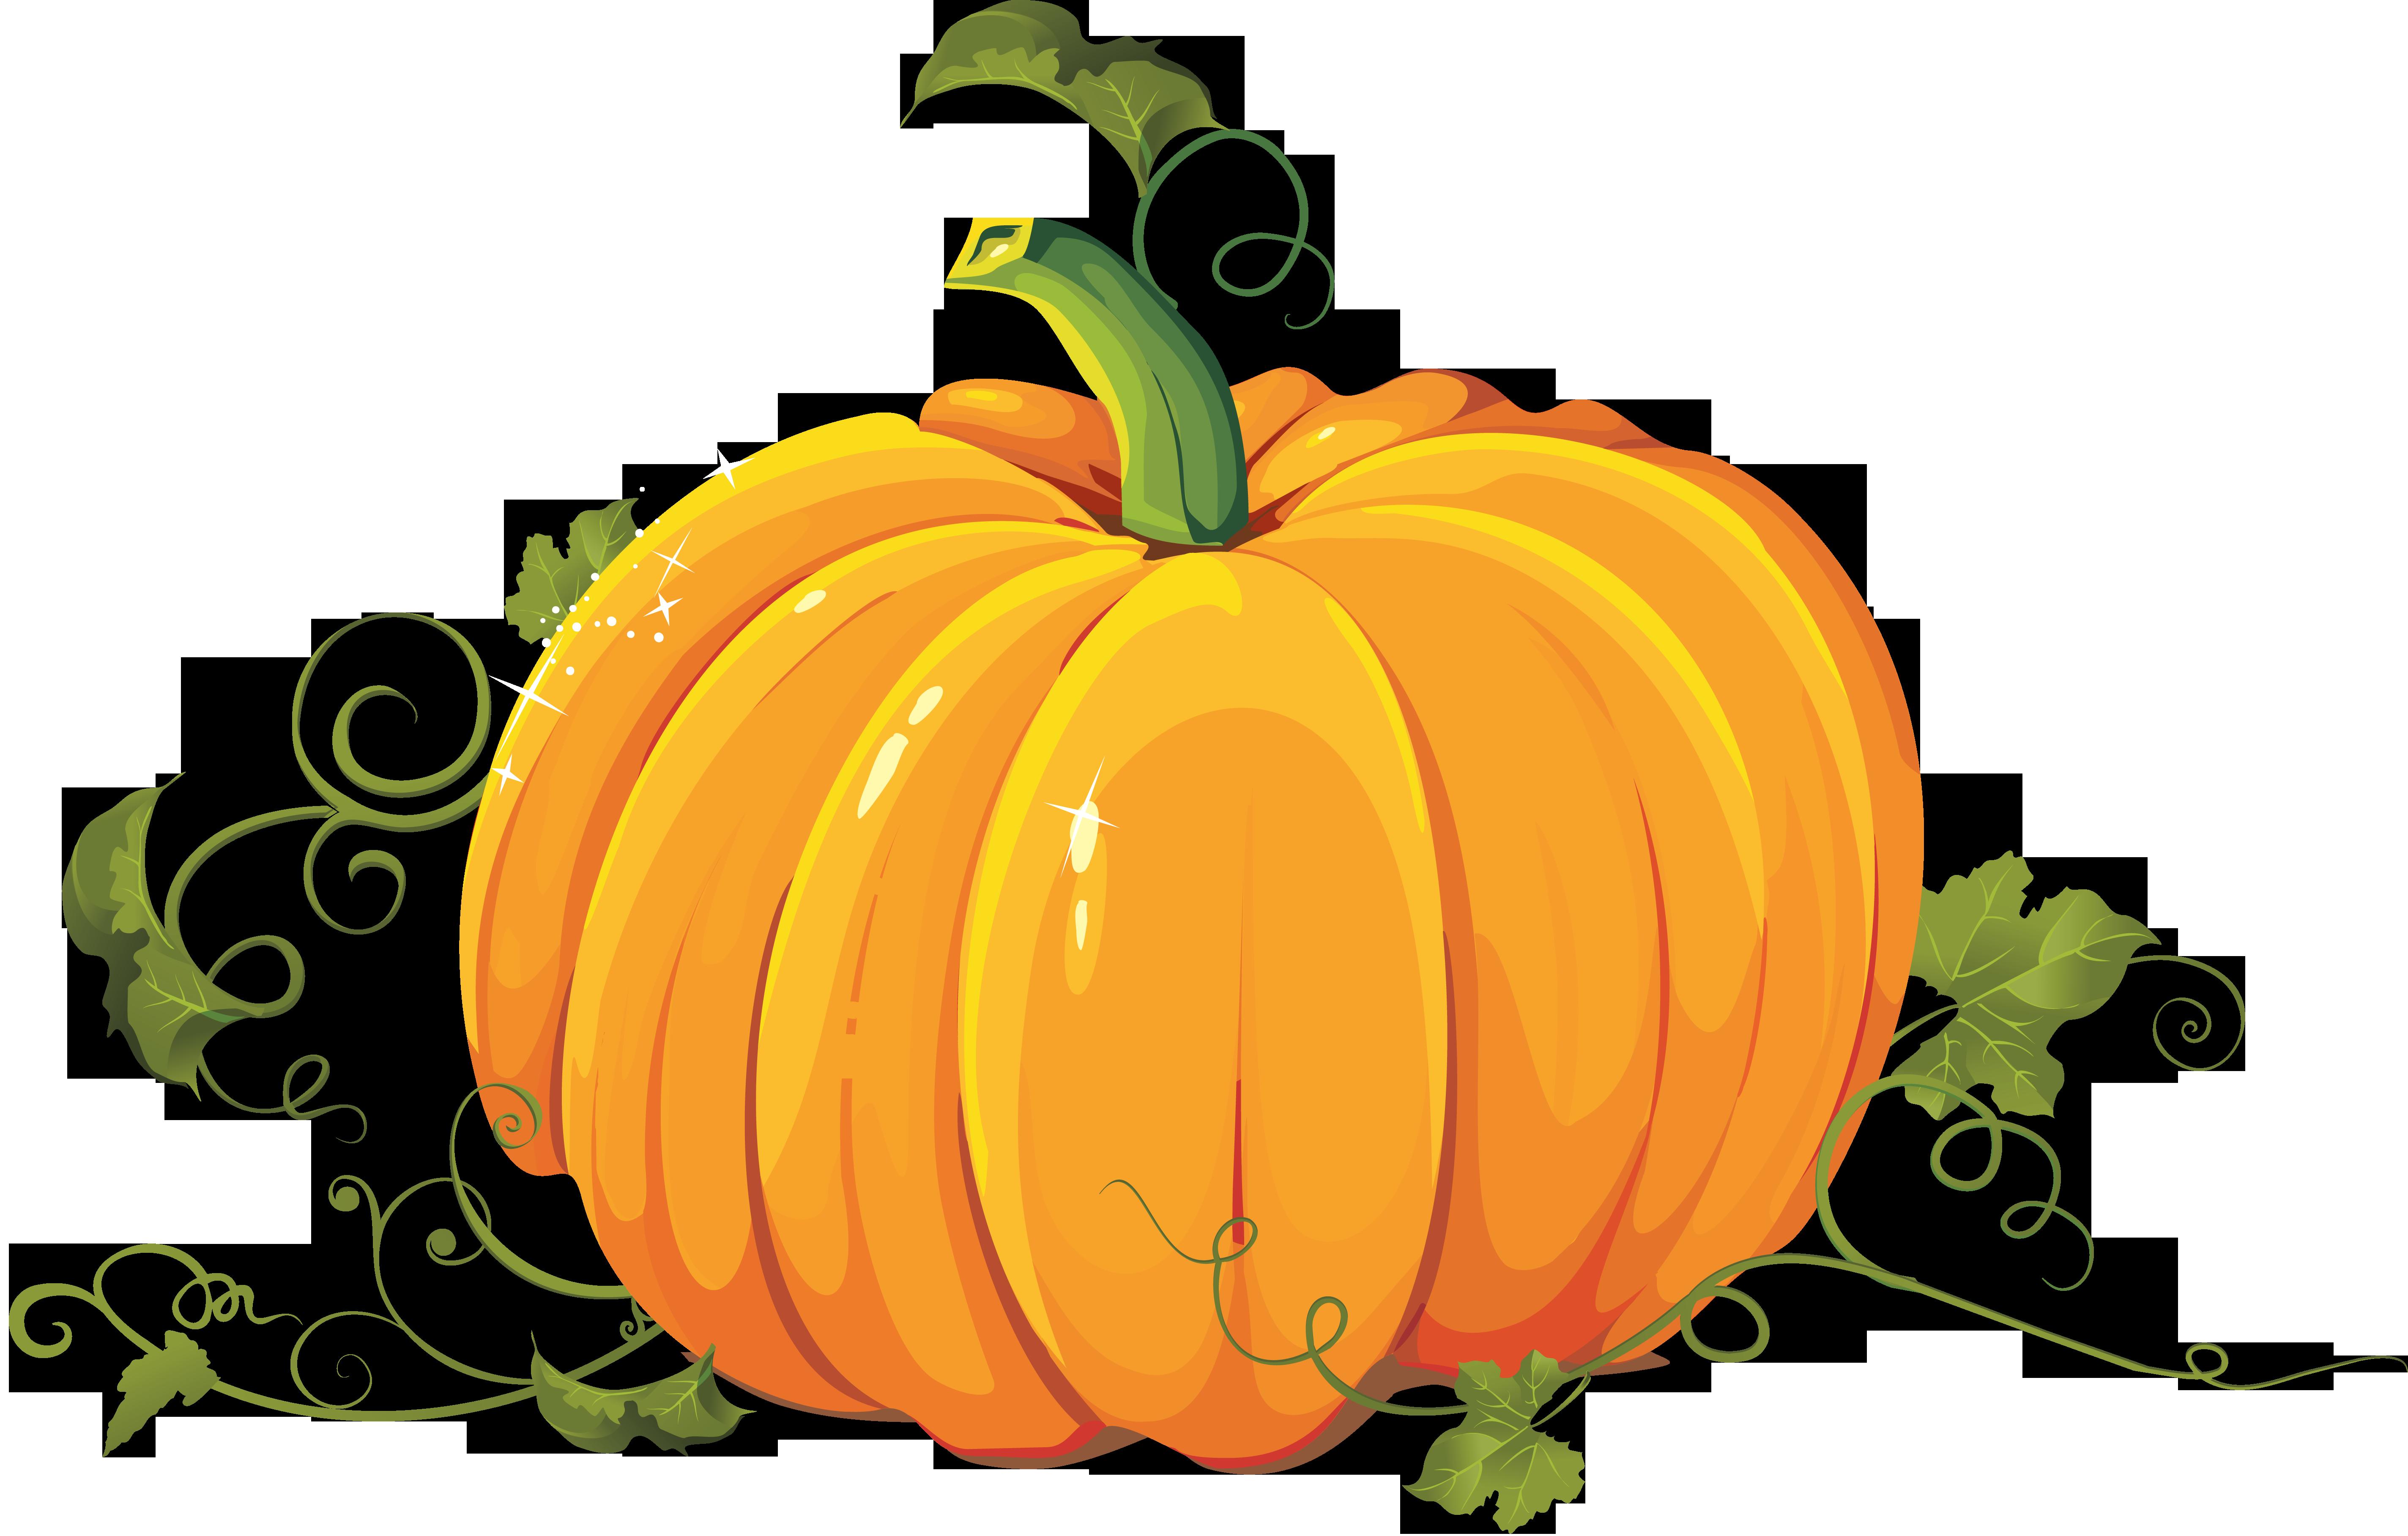 Pumpkin PNG Image - PurePNG | Free transparent CC0 PNG ...